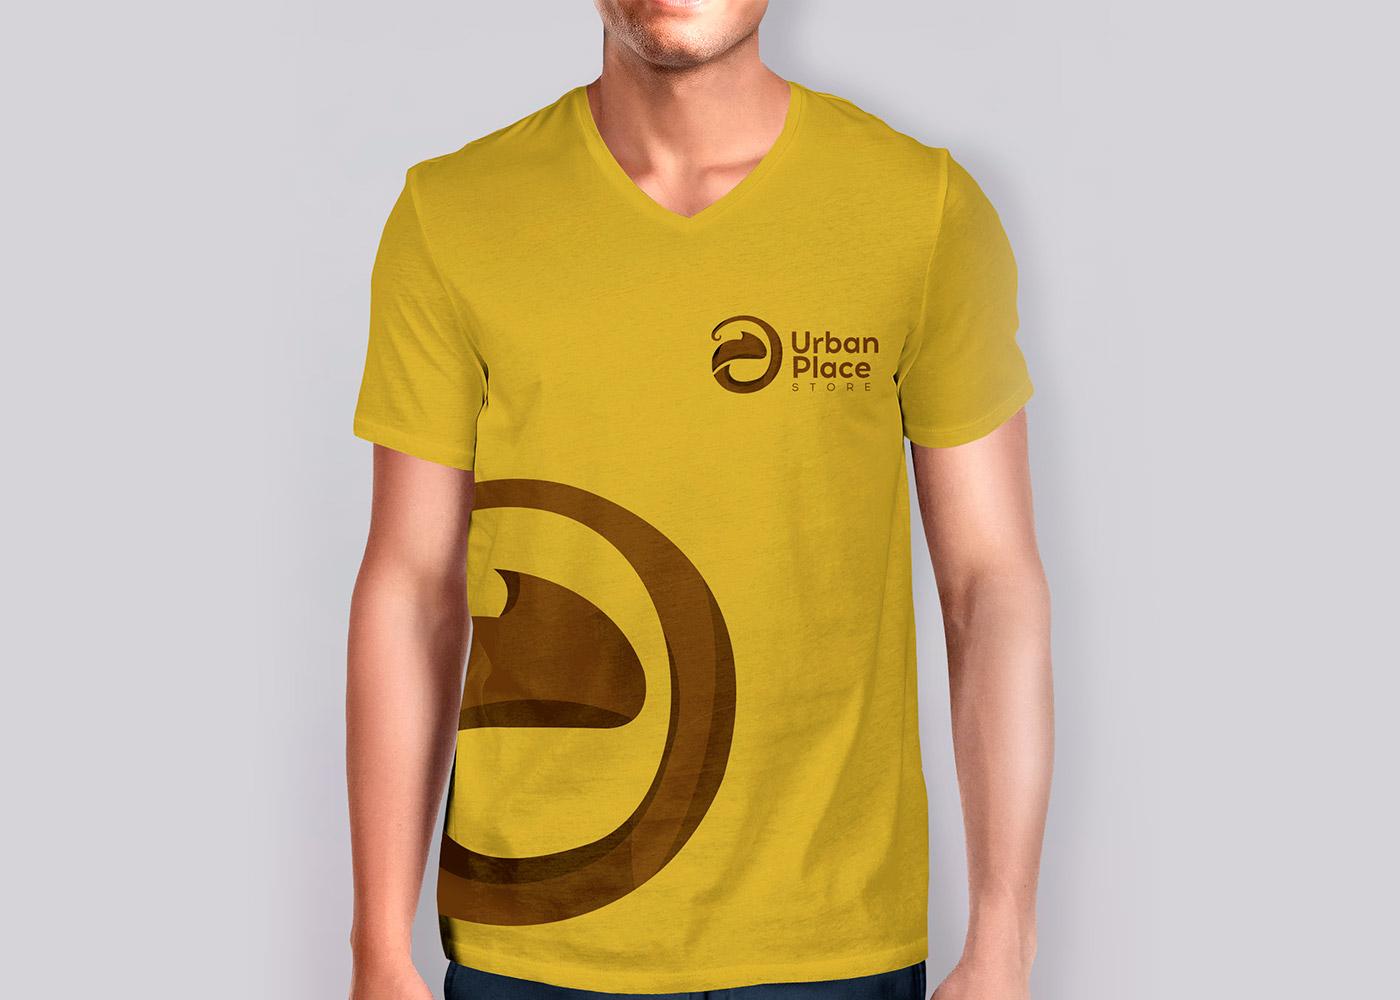 urban-place-shirt